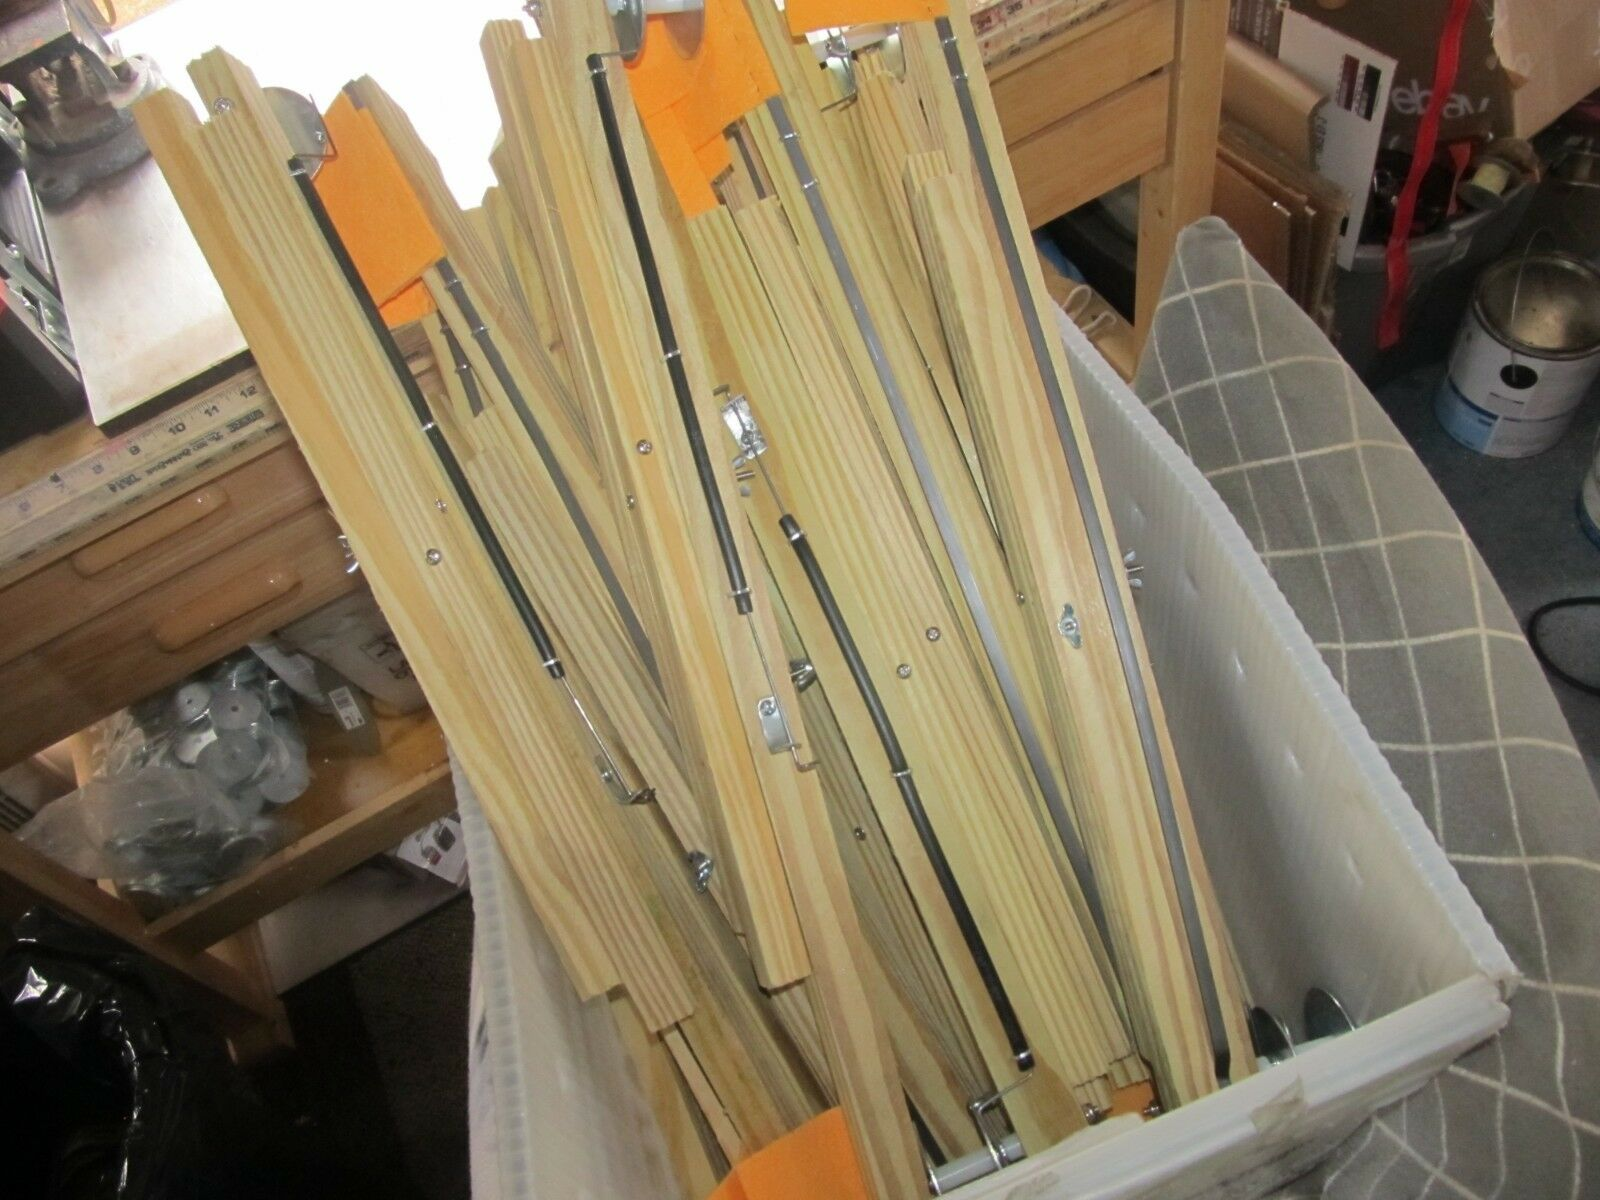 5 SURPLUS WOOD ICE  FISHING TIP UPS 22  LONG 300 FT. SPOOL 3X3 orange FLAG  70% off cheap